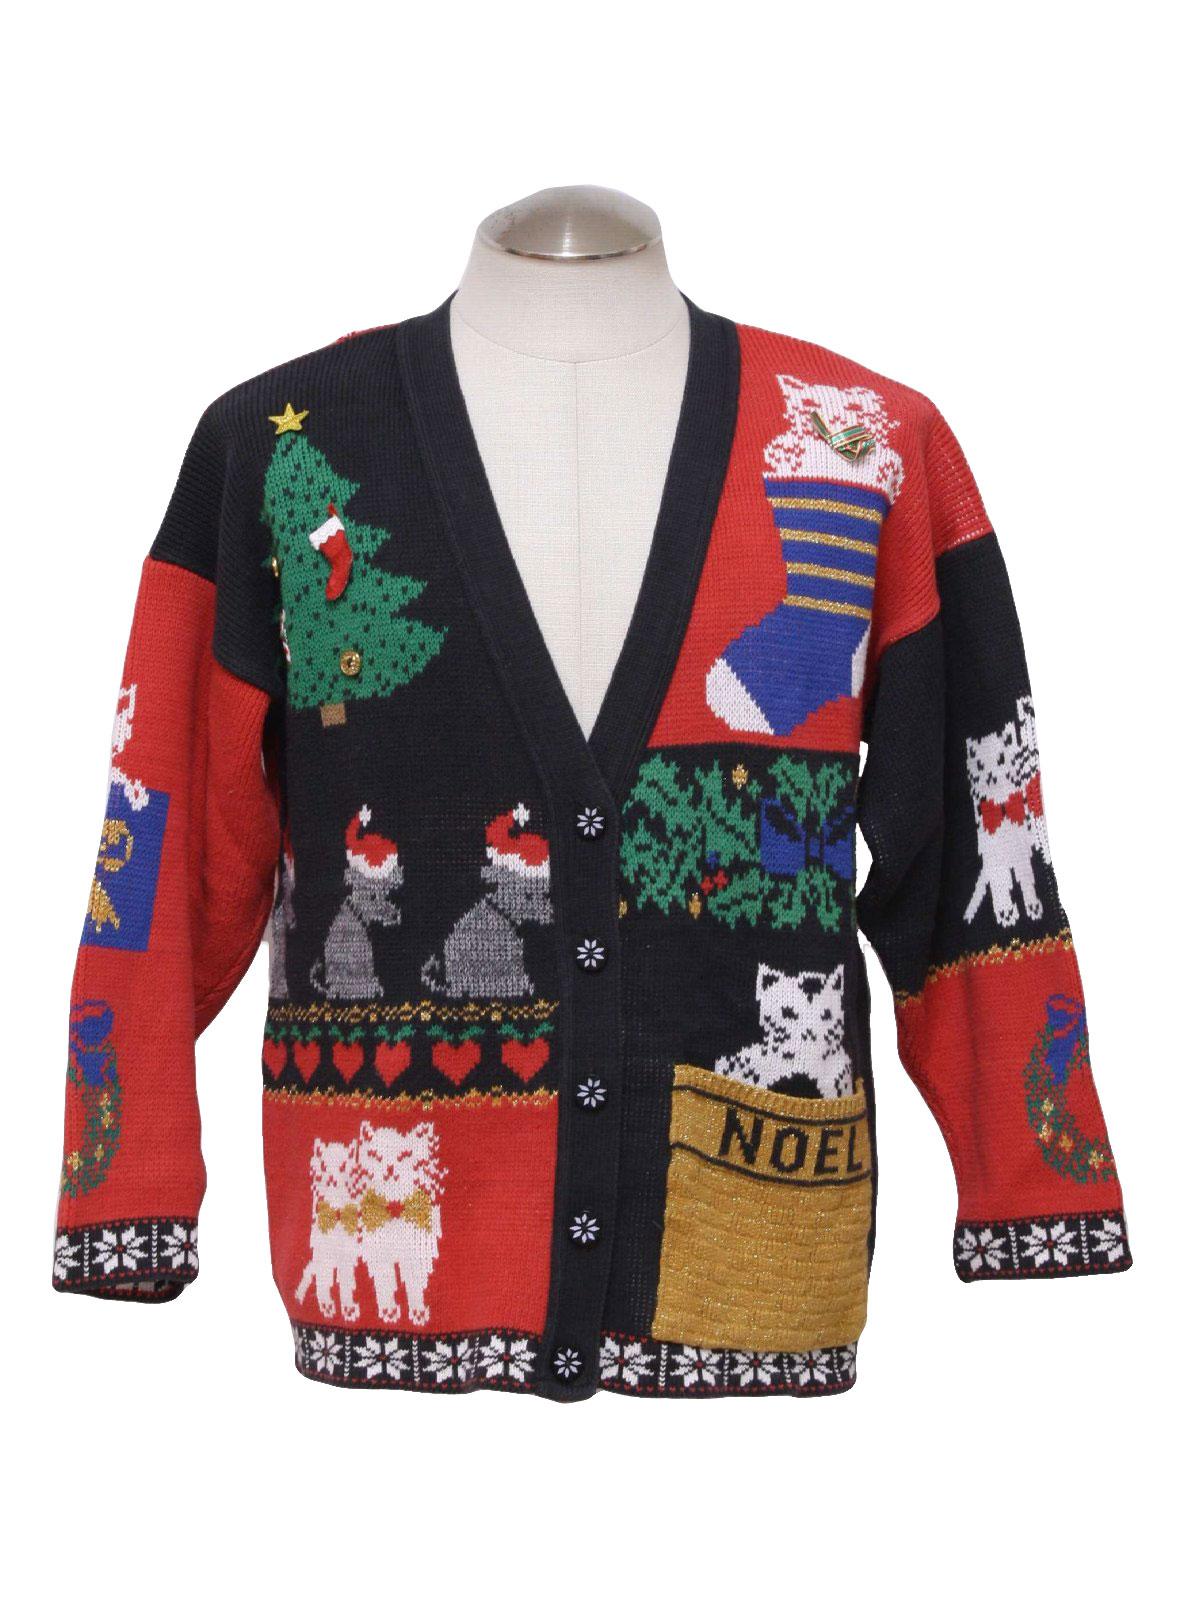 cardigan ugly Christmas Sweater, cardigan neckline with Christmas